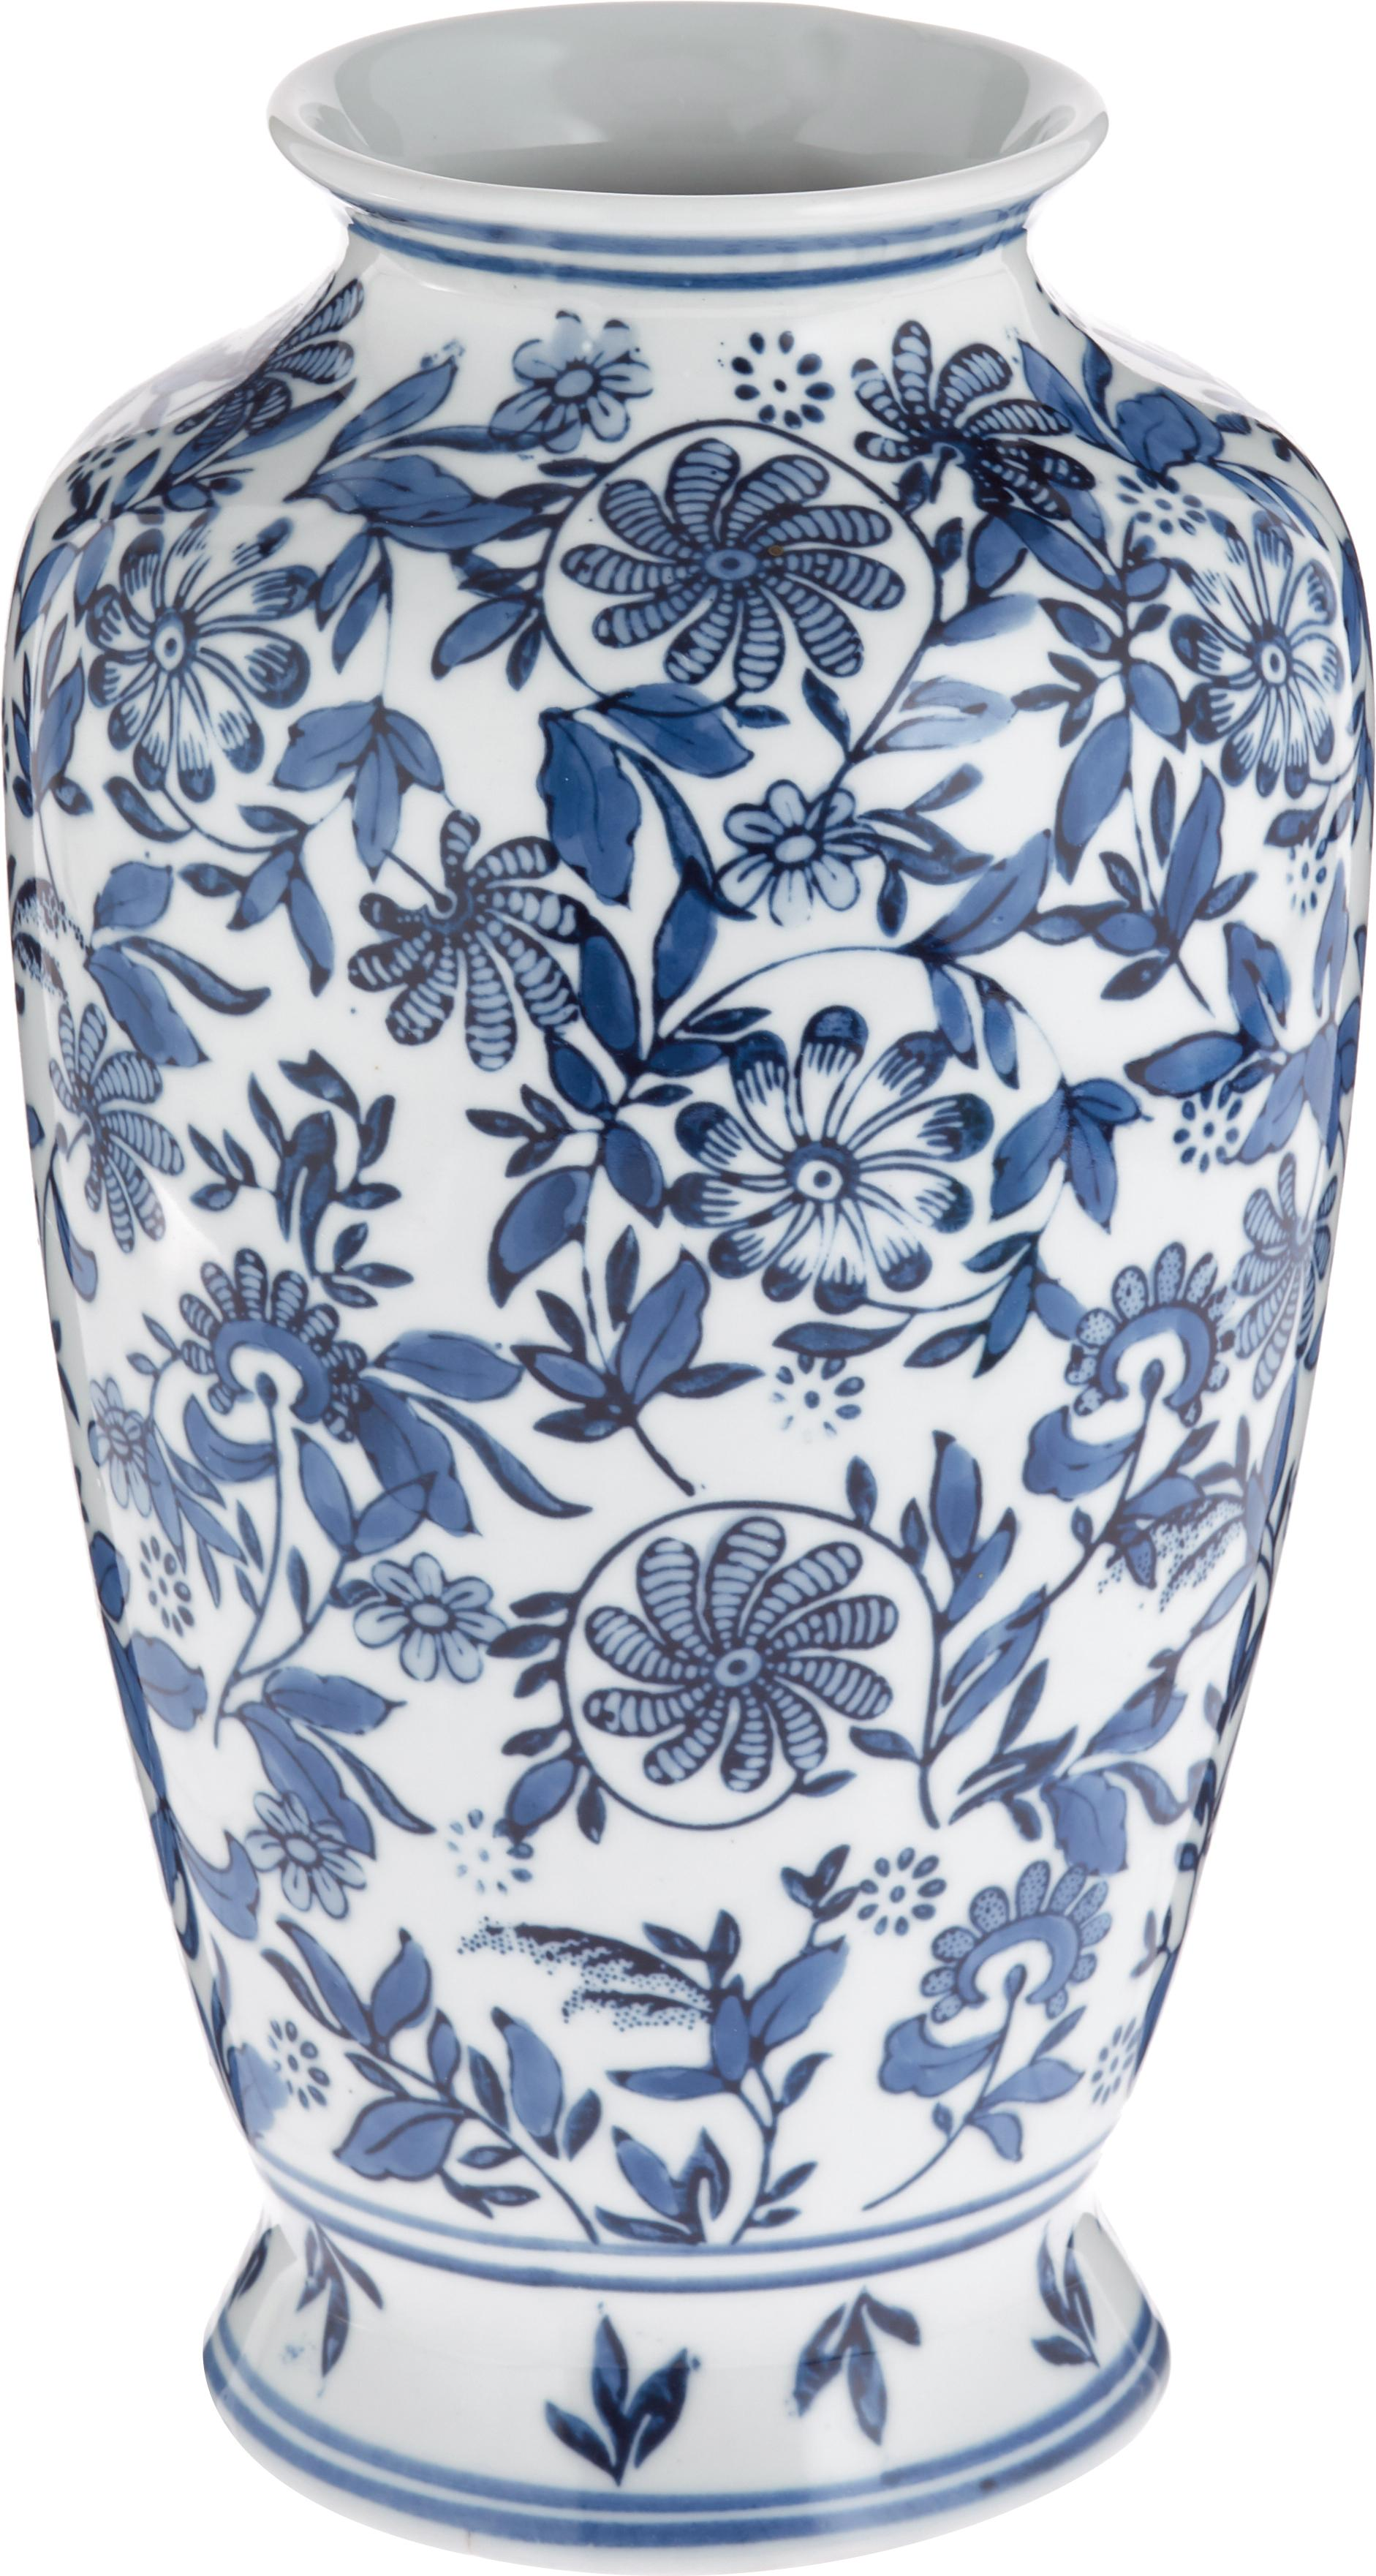 Jarrón grande de porcelana Lin, Porcelana, no impermeable, Azul, blanco, Ø 16 x Al 31 cm